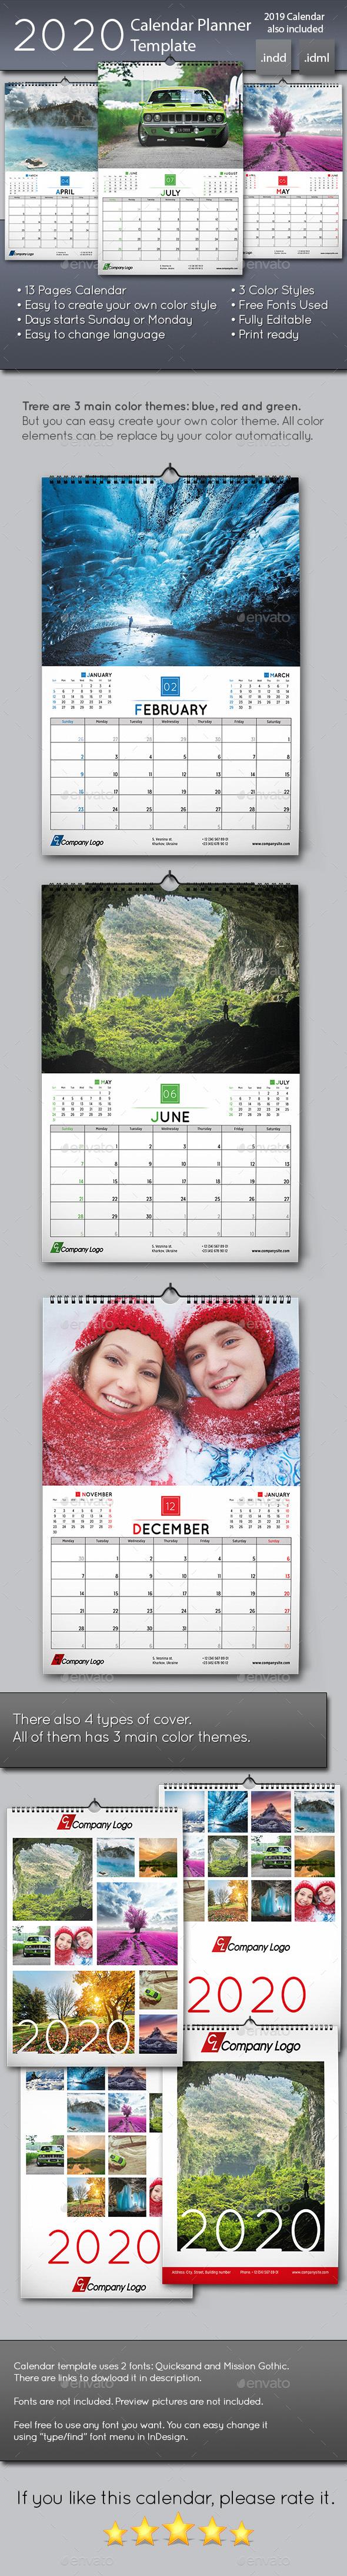 Calendar Templates & Designs From Graphicriver